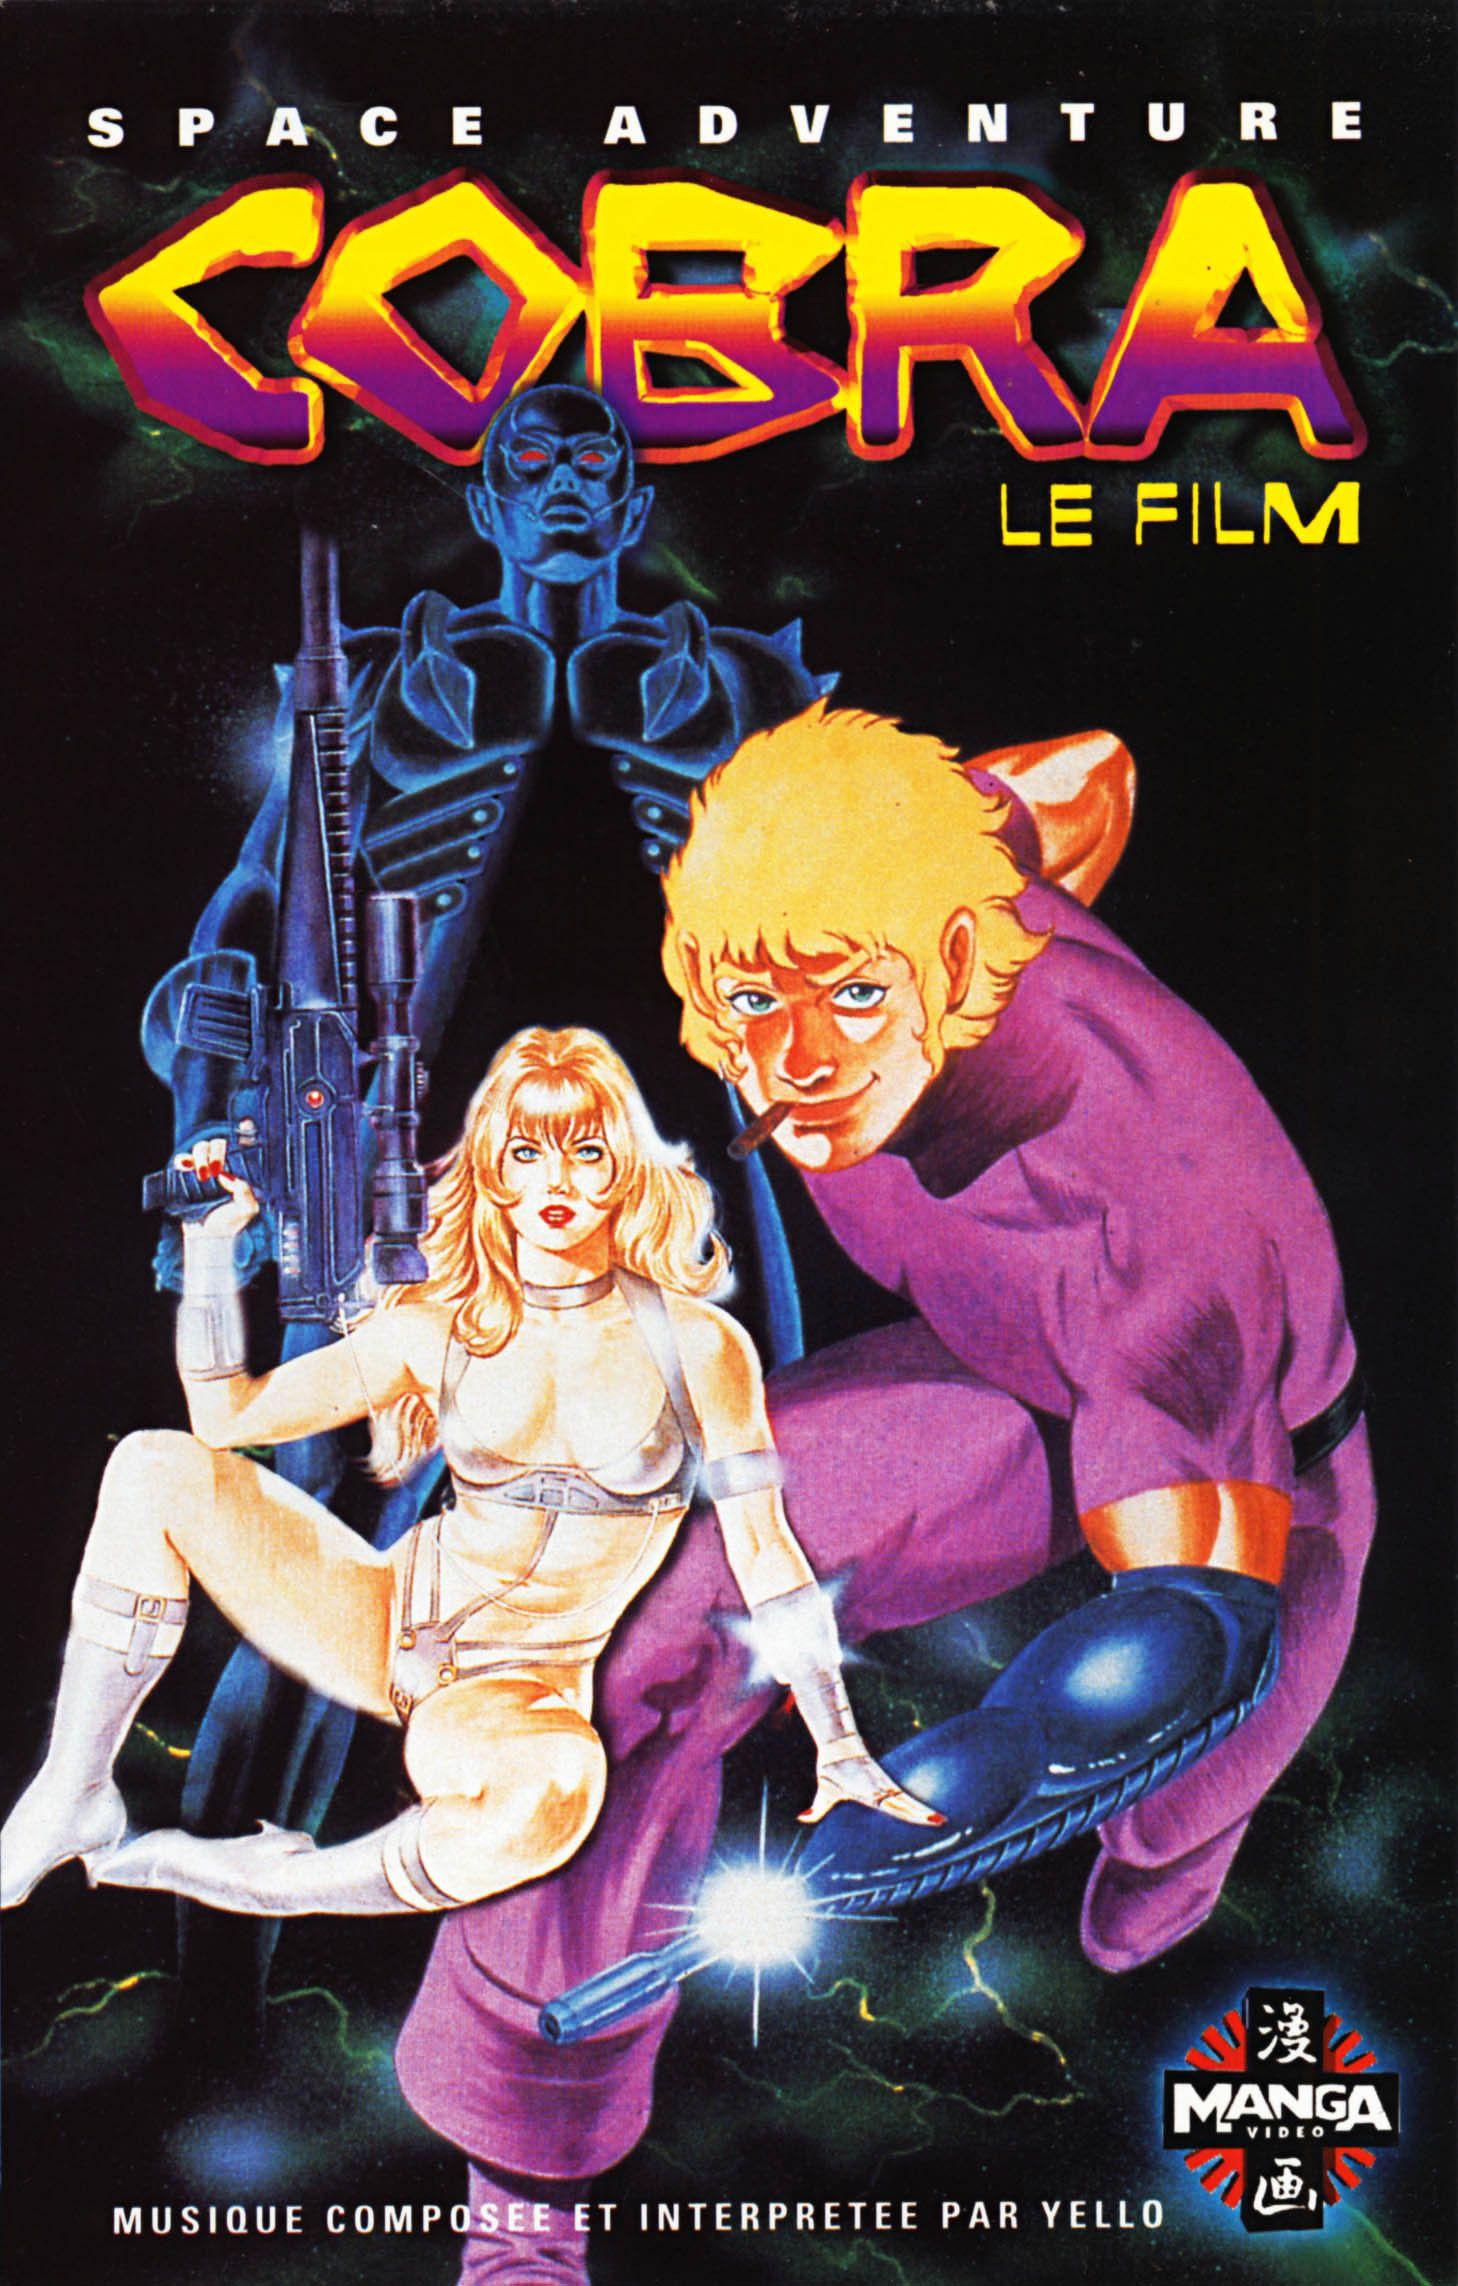 Animation - Manga : Sortie ciné TV-  DVD- Blu-Ray a pas louper - Page 3 Cobra_le_film